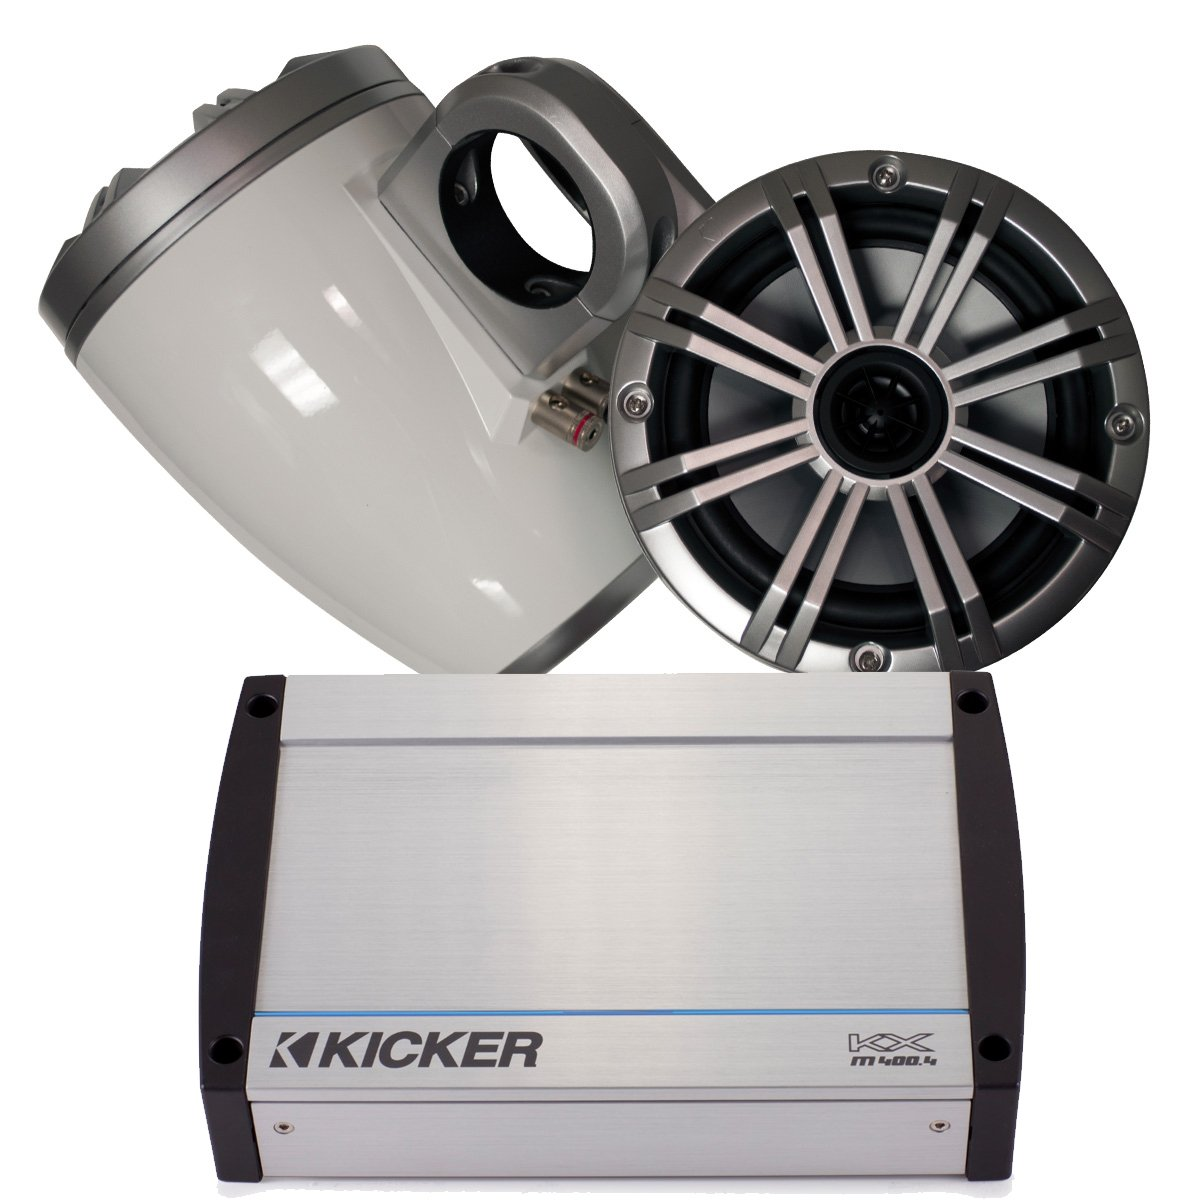 Kicker Marine WakeタワーシステムW /シルバー6.5スピーカー、キッカー40 kxm400.4 400ワットアンプ B01MR9TNLV